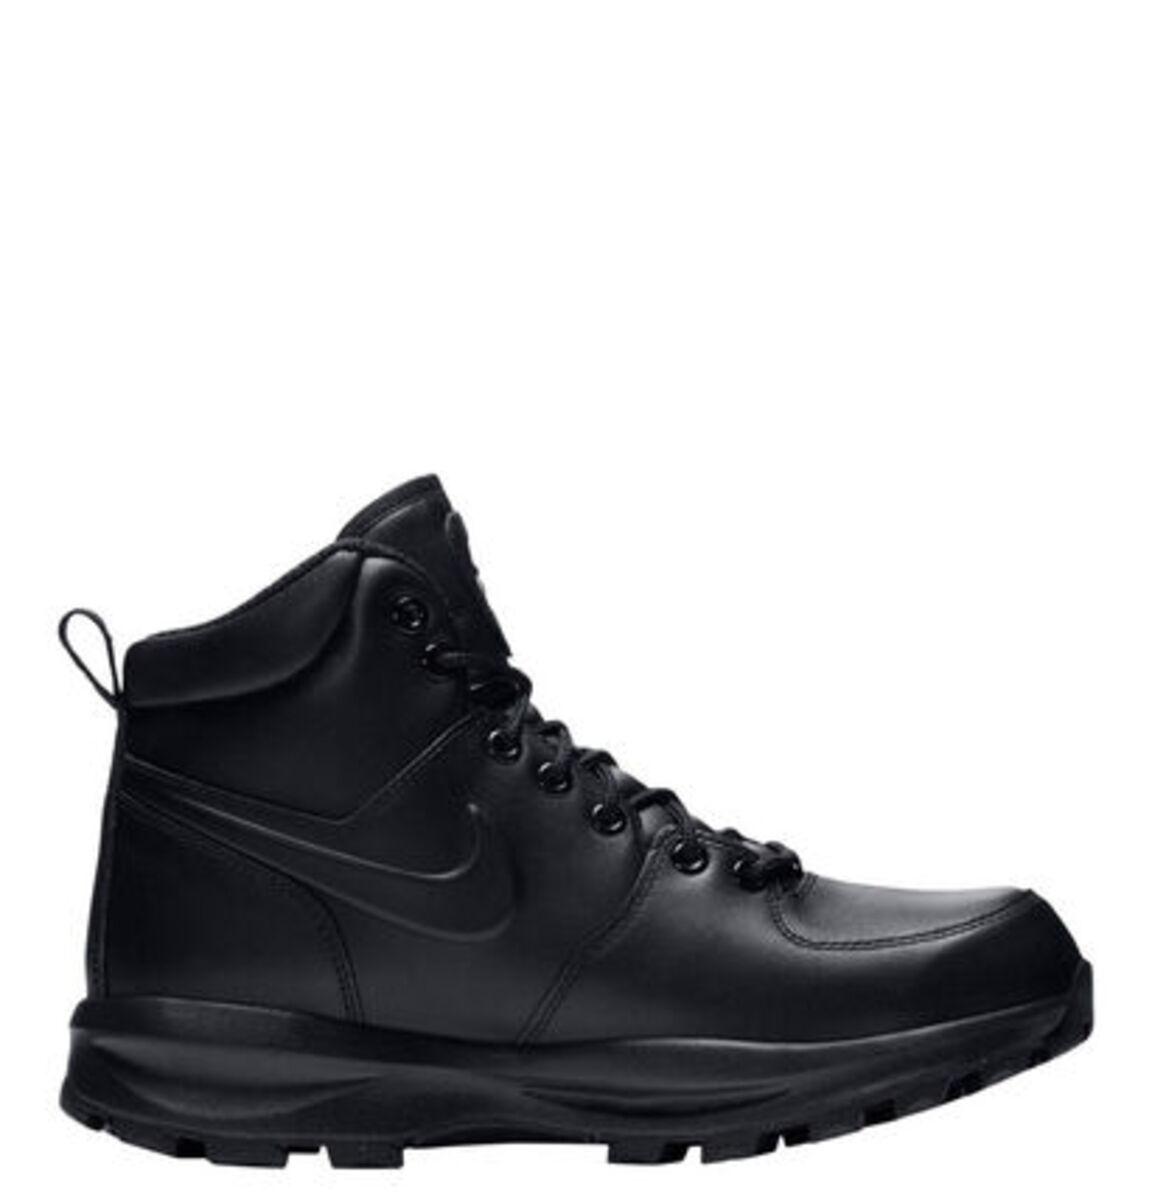 Bild 1 von Nike Herren Boots Manoa